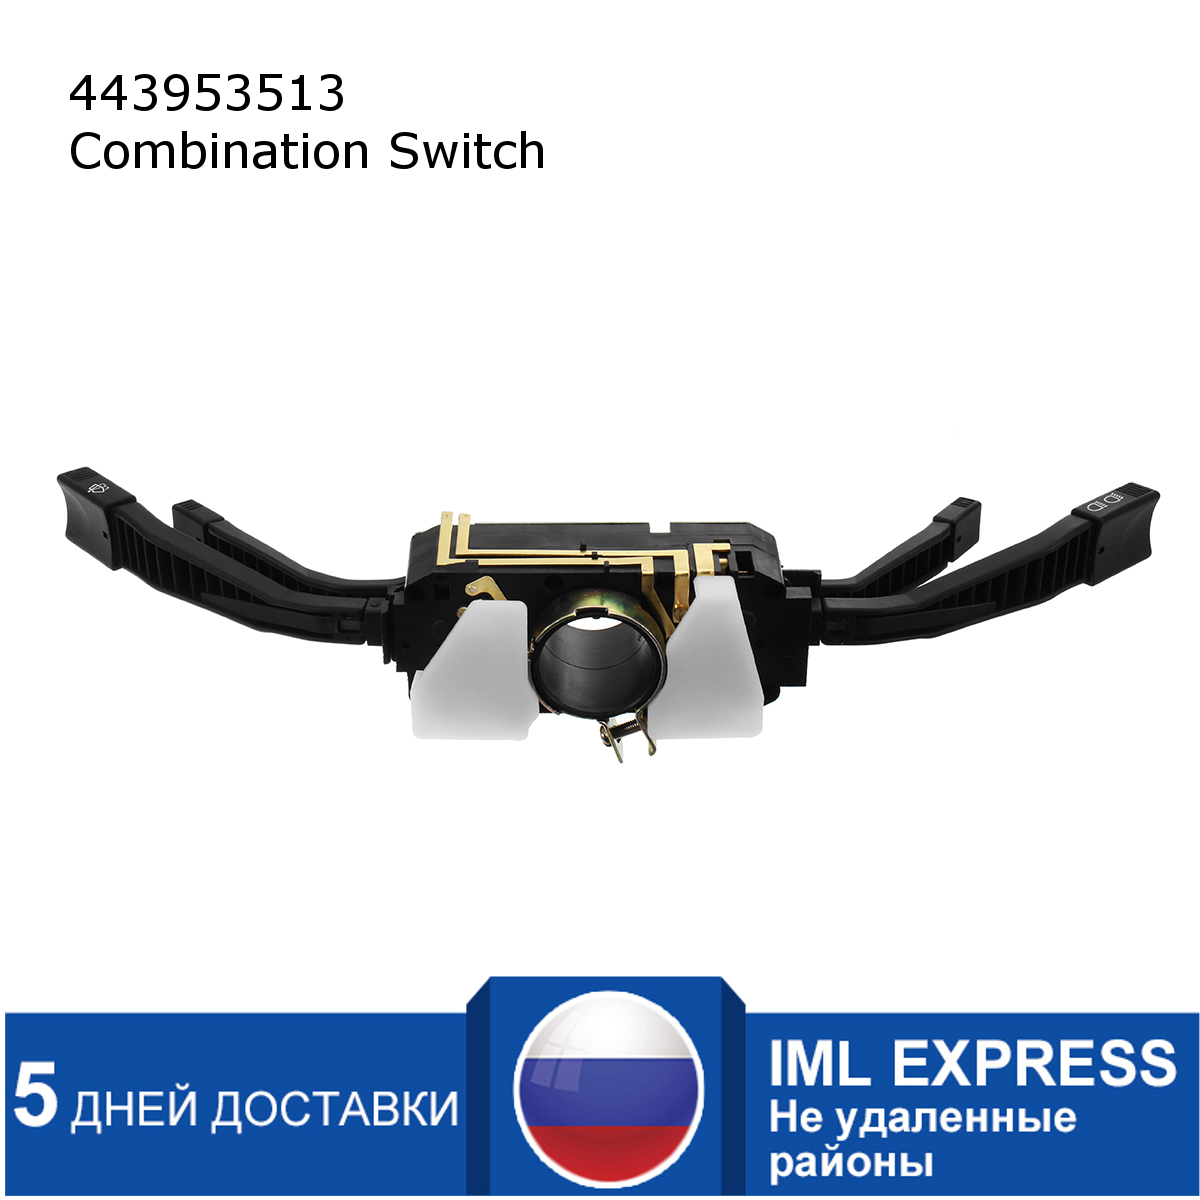 Sinal de Volta indicador Interruptor Combinação Coluna Avant Sedan CABRIOLET 443953513 Para Audi 100 80 B3 B4 90 C3 C4 200